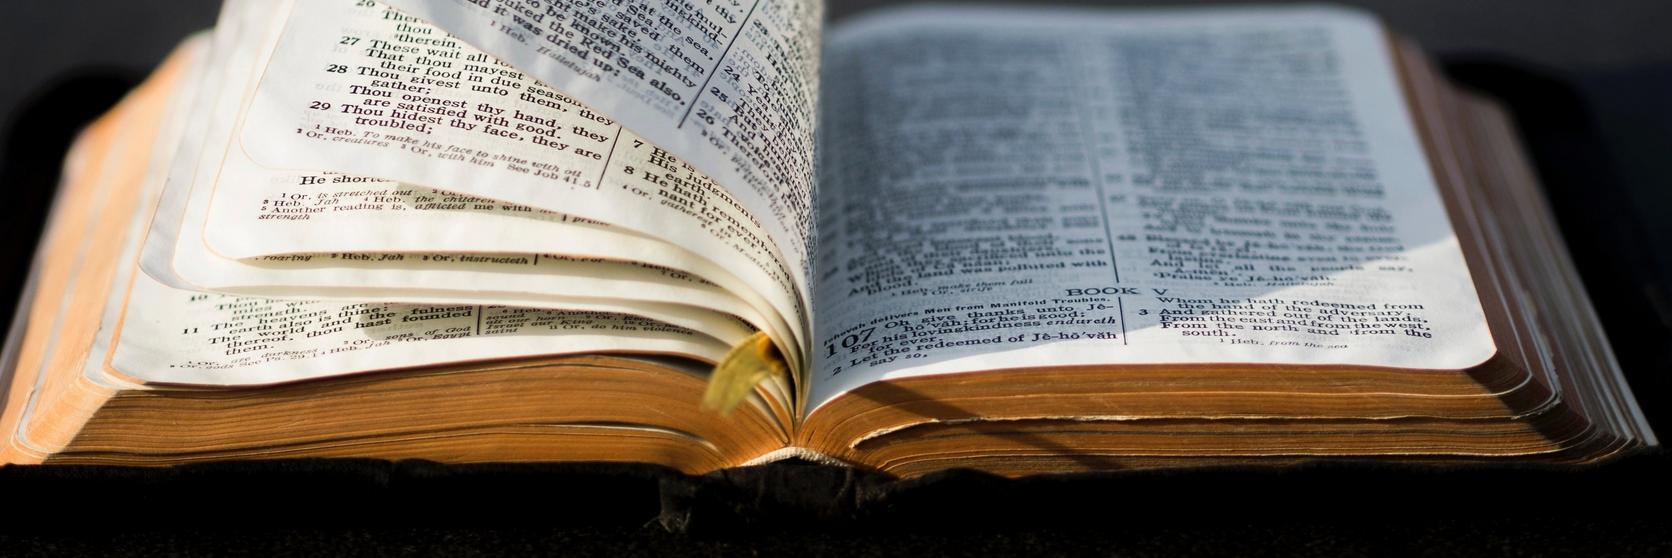 religious-sympathy-messages-bible